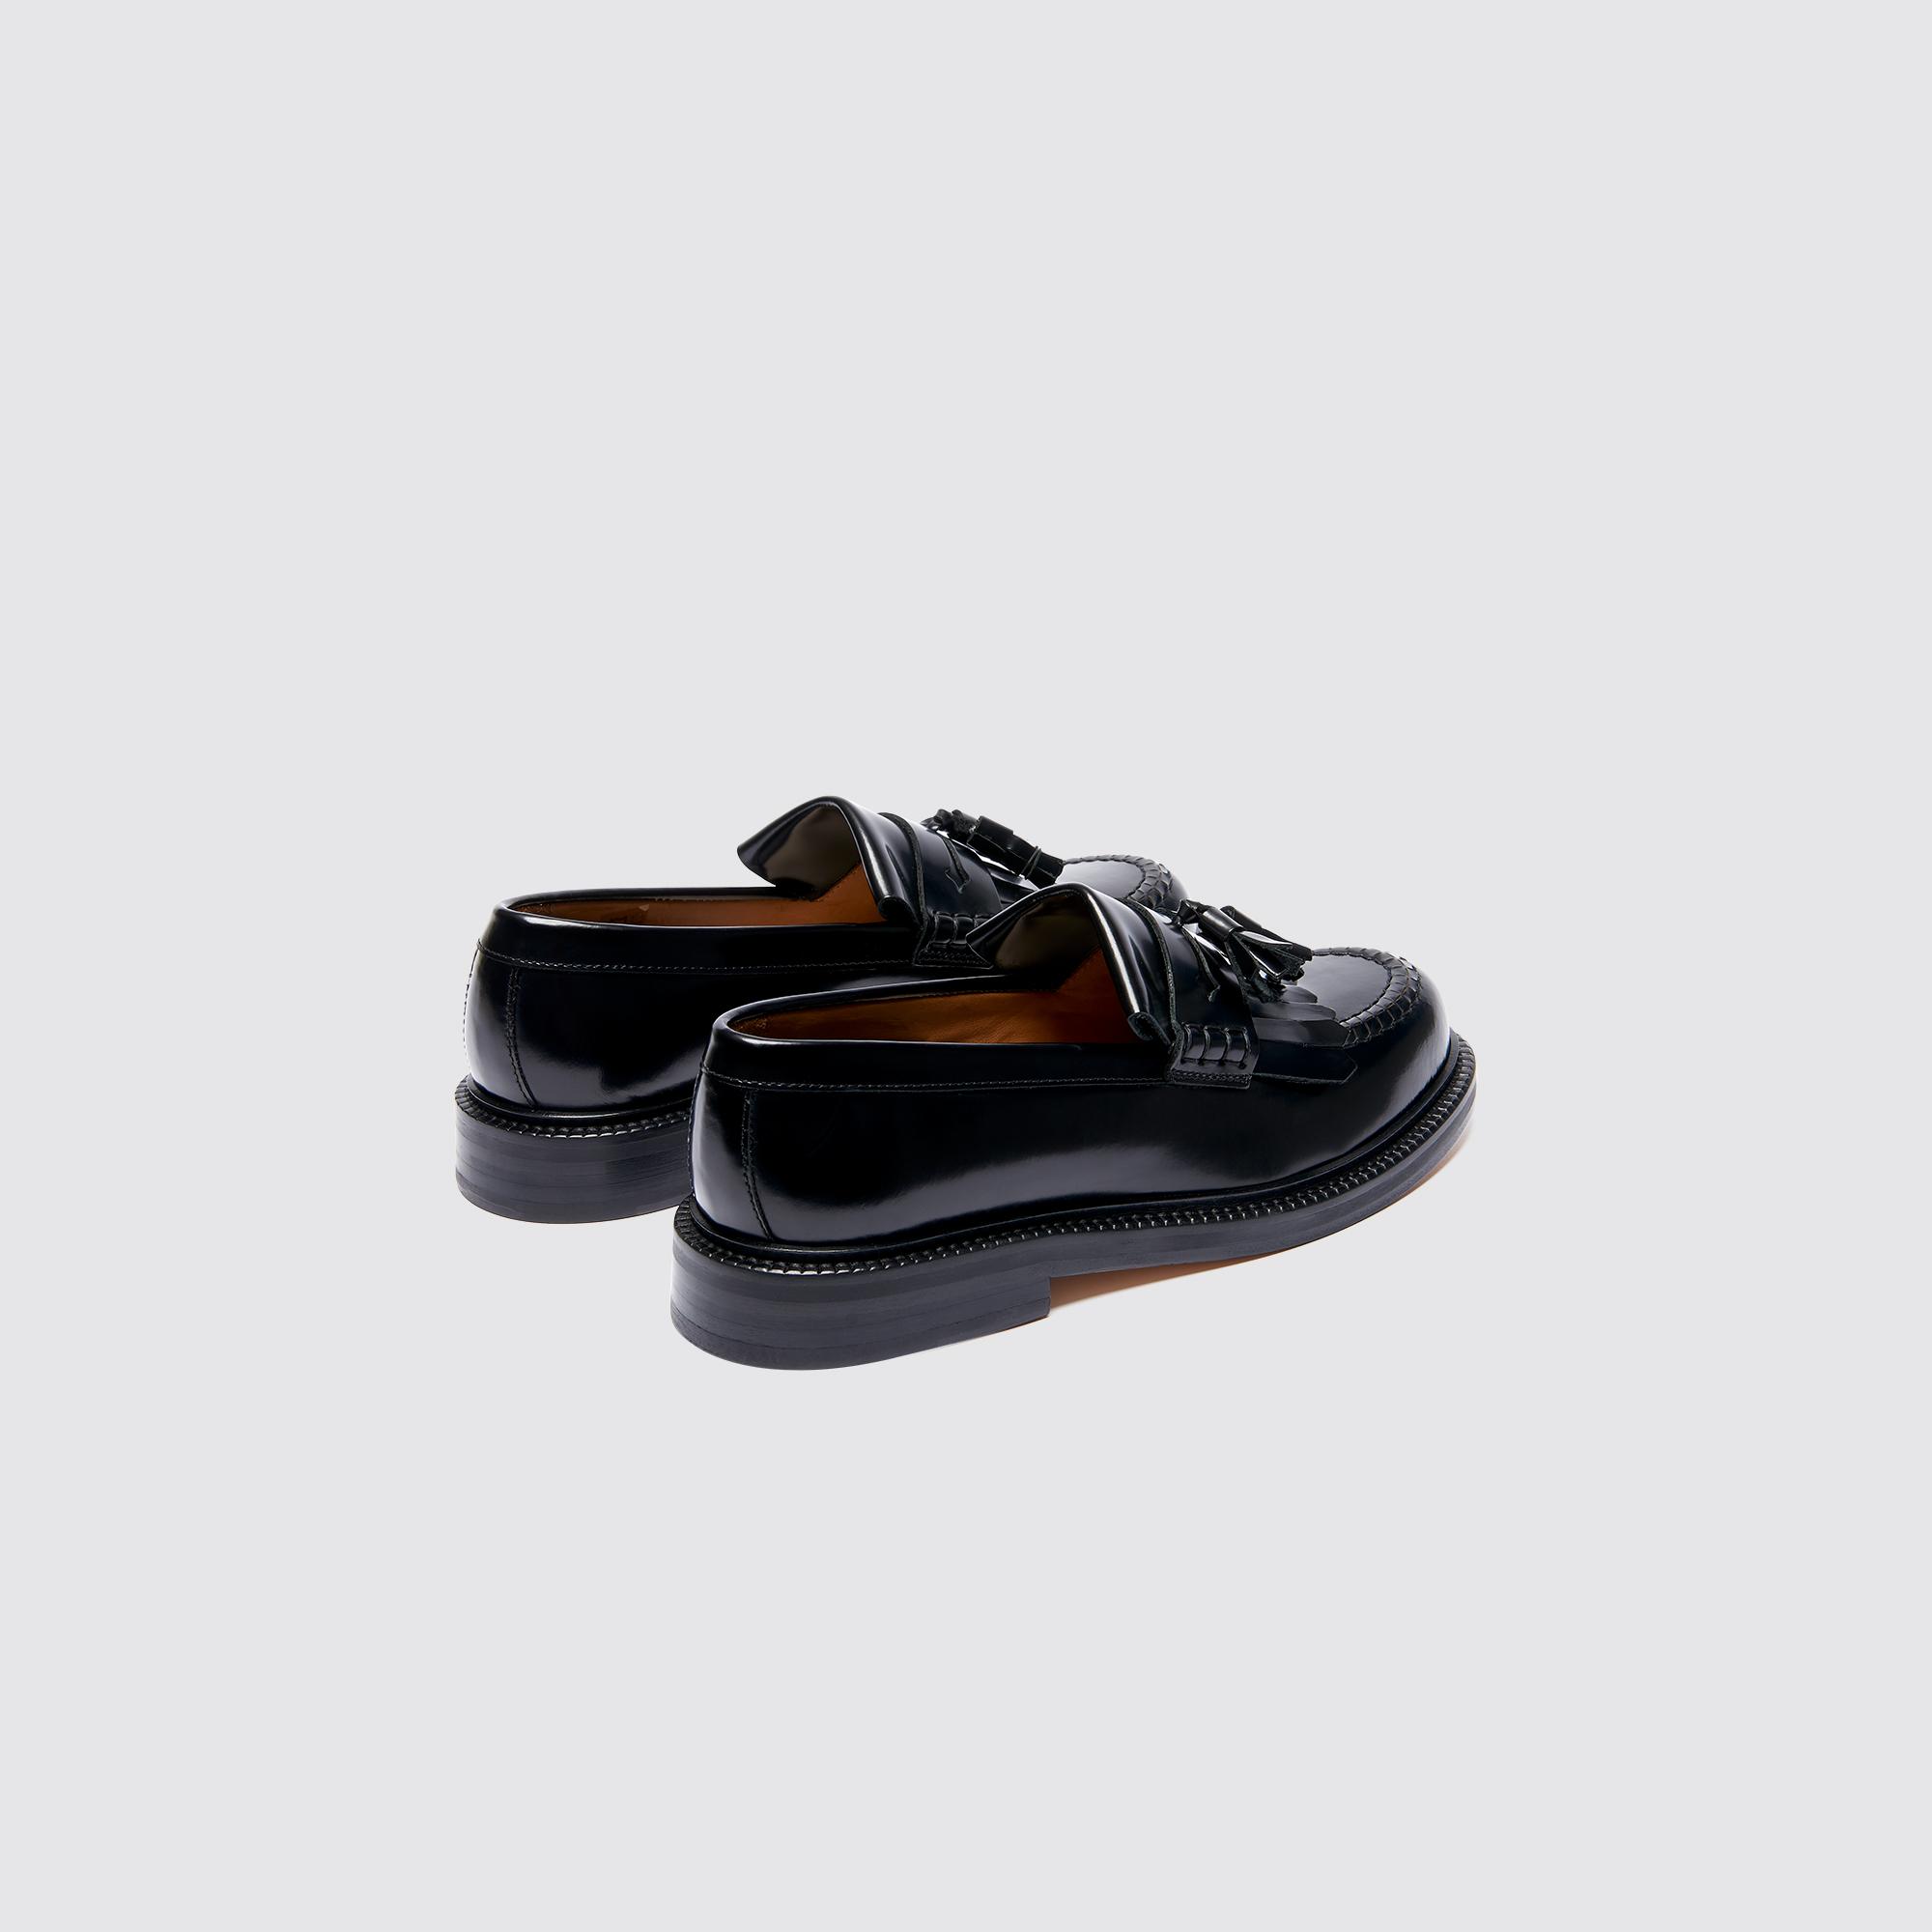 Sandro en Chaussures glacé Mocassins CH1397W Paris cuir SBpXwX